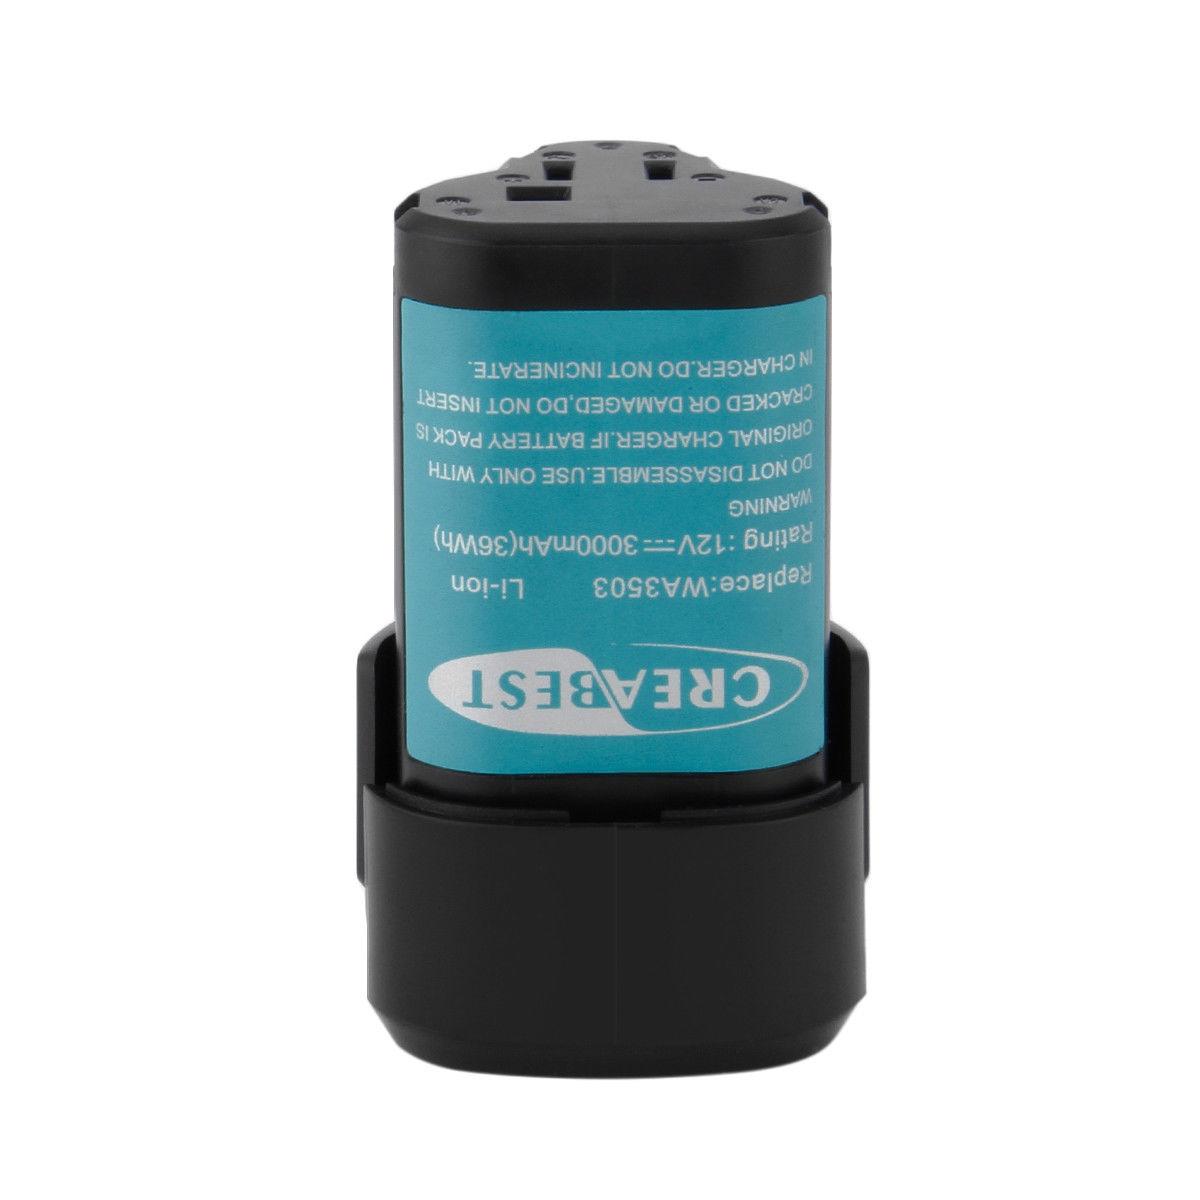 Tool Battery : battery-plus nl , Hoge kwaliteit, lage prijs